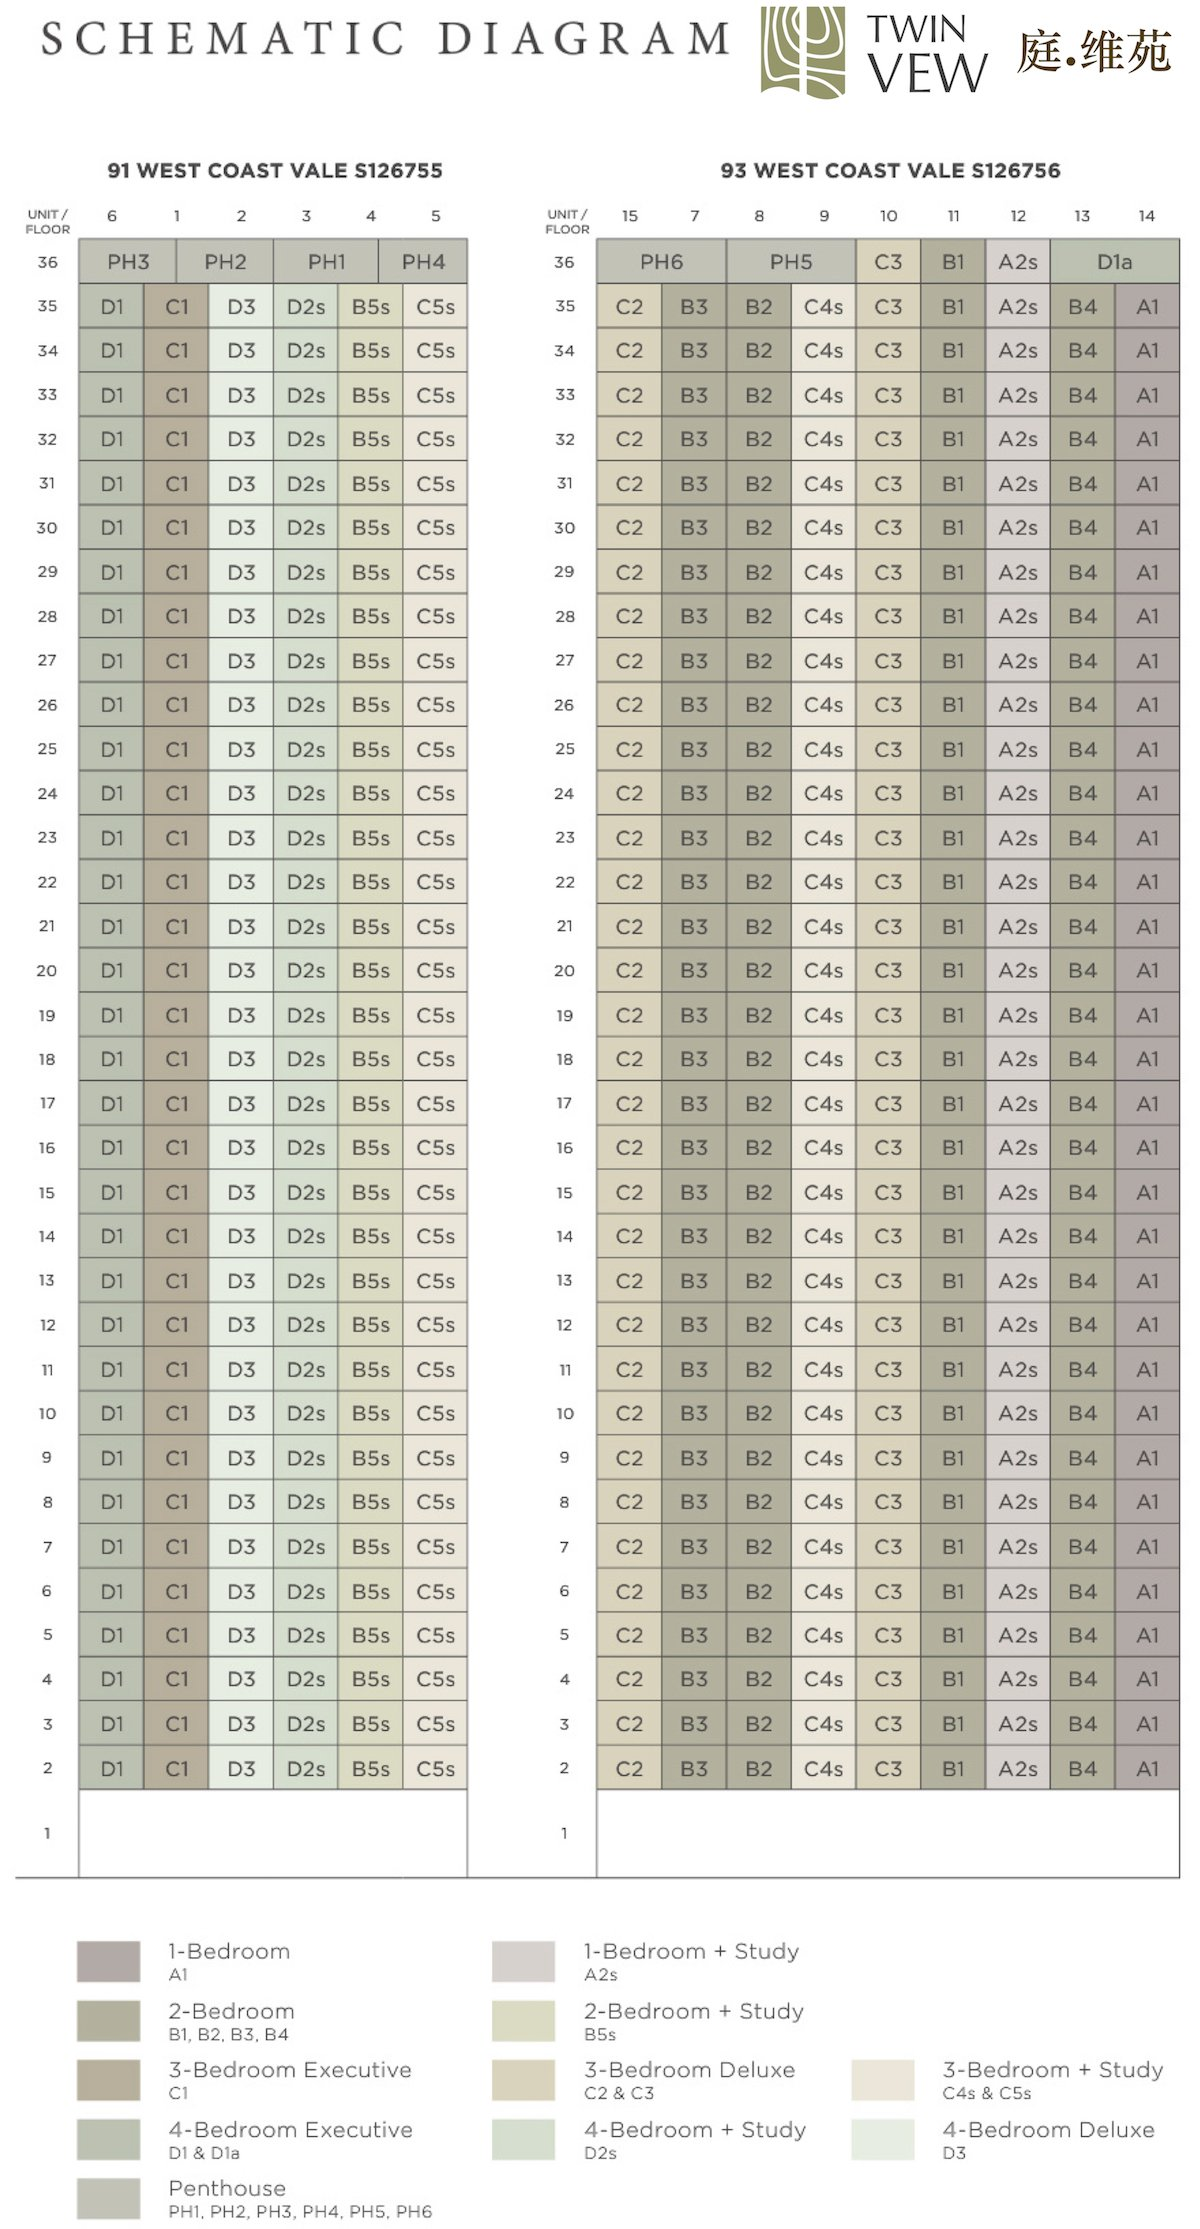 Twin VEW unit schematic elevation chart